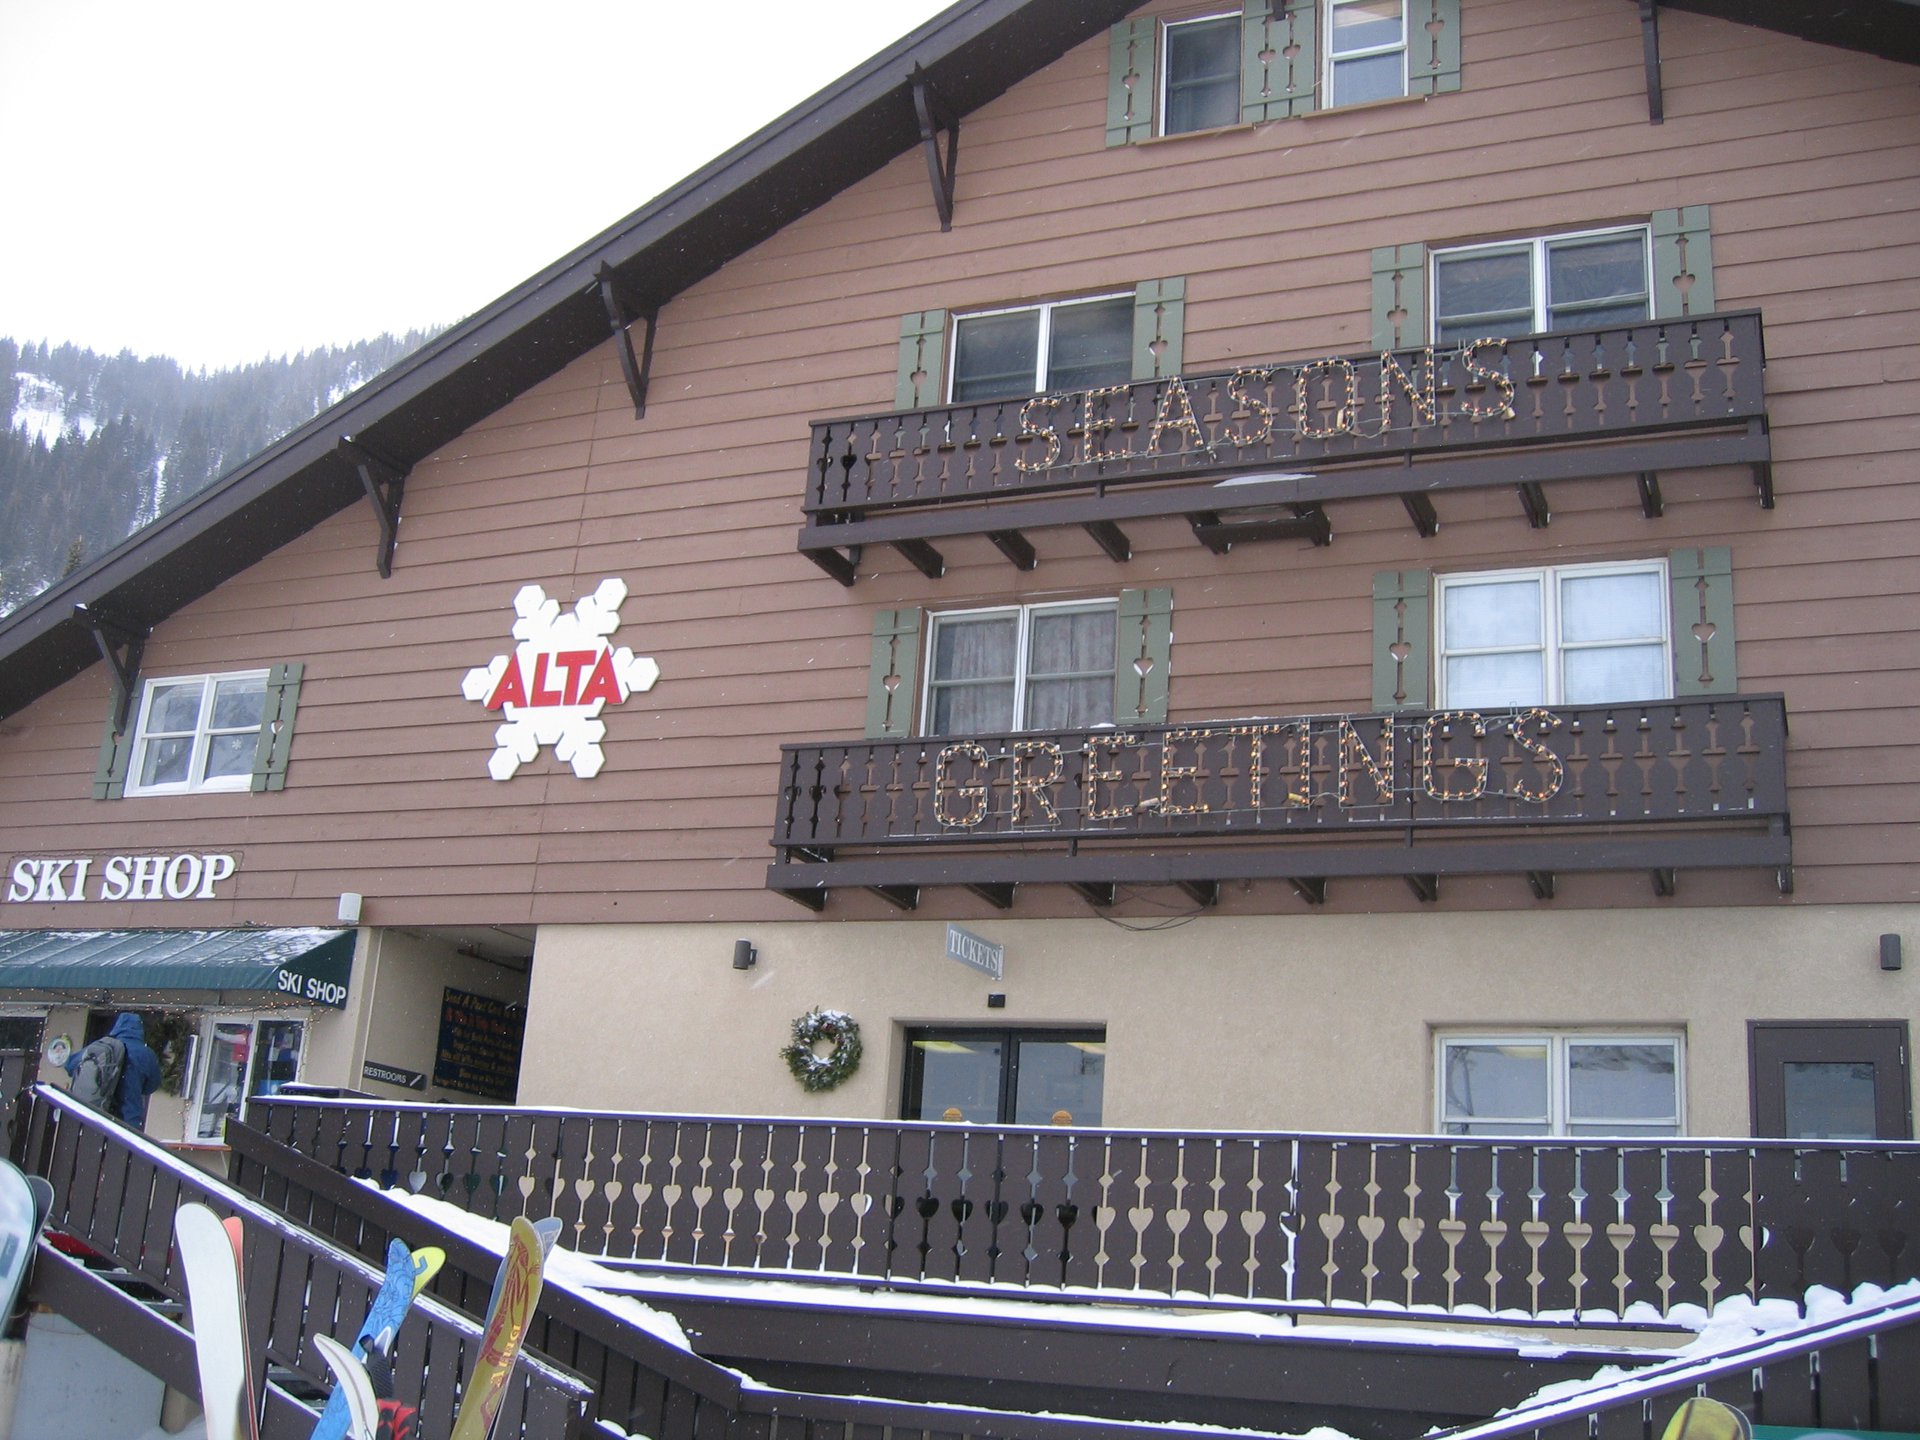 Alta Ski Shop